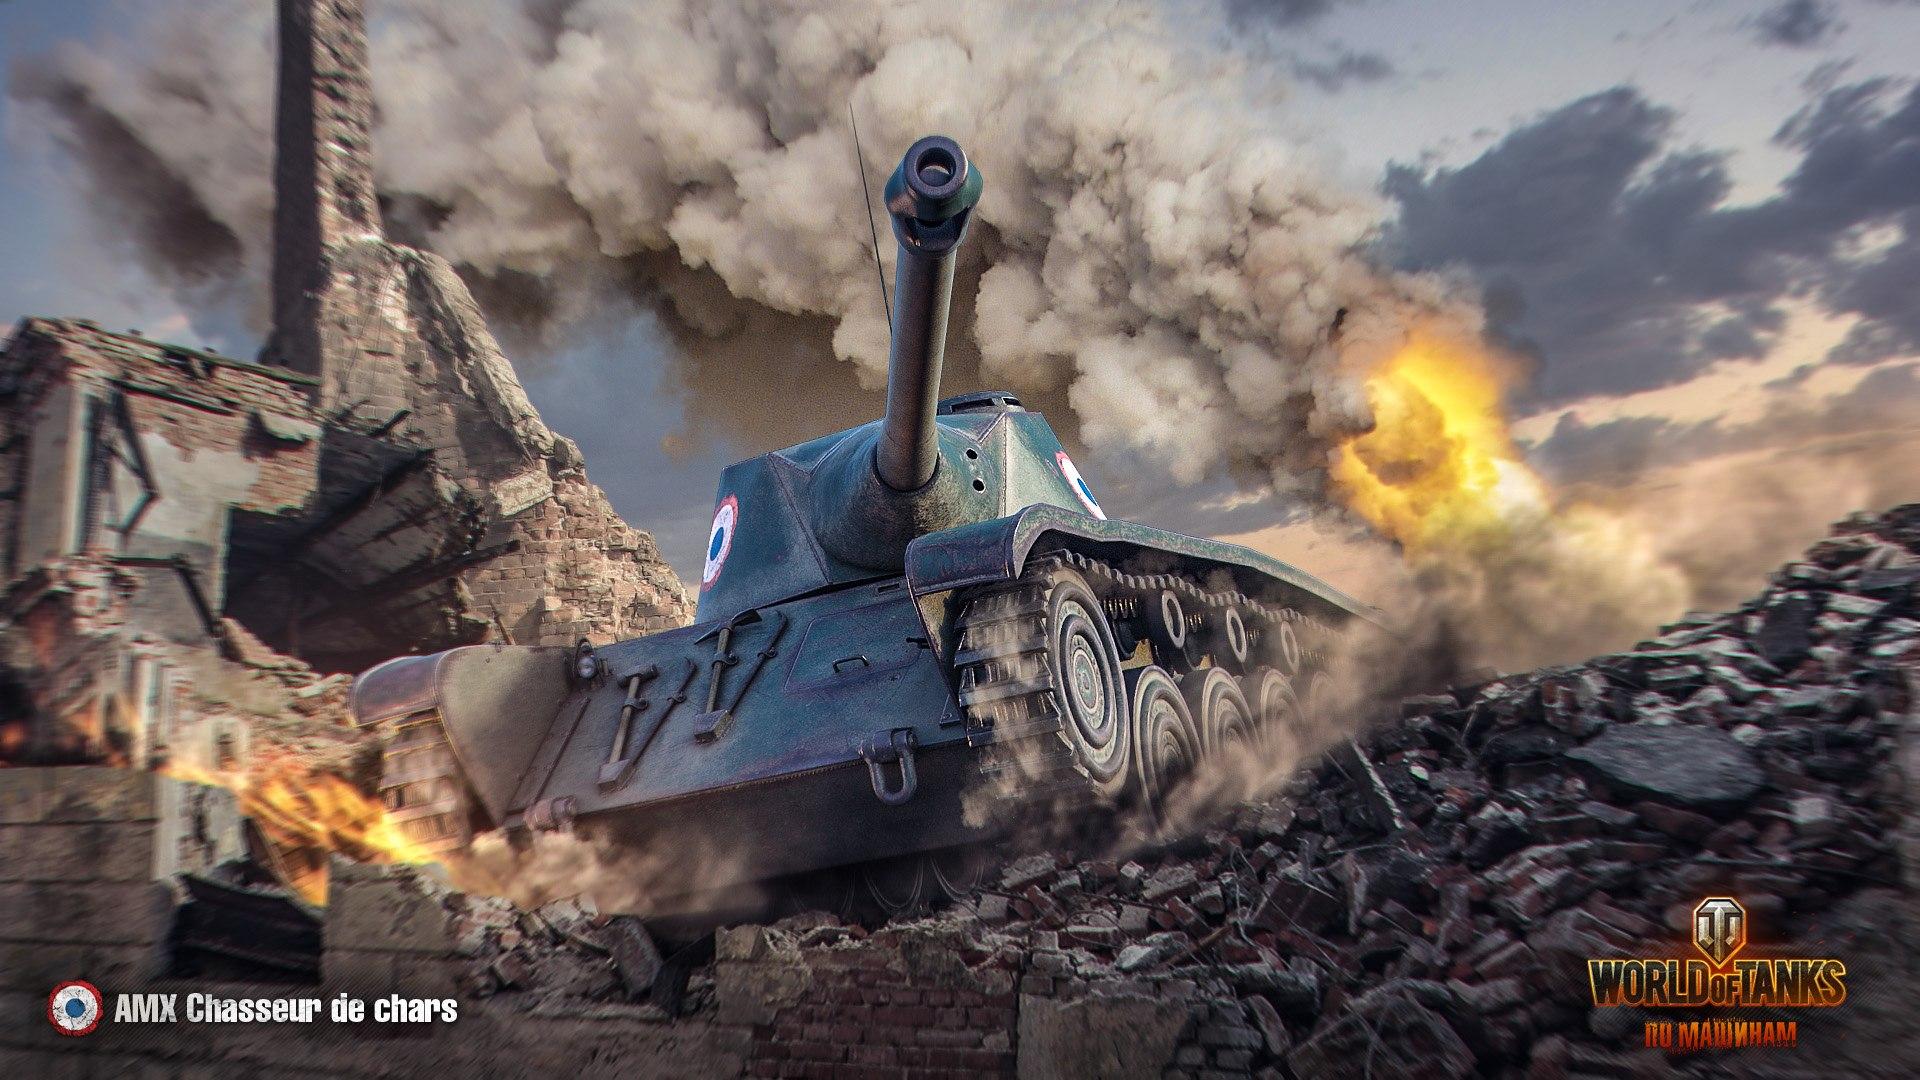 рисунок AMX Chasseur de chars